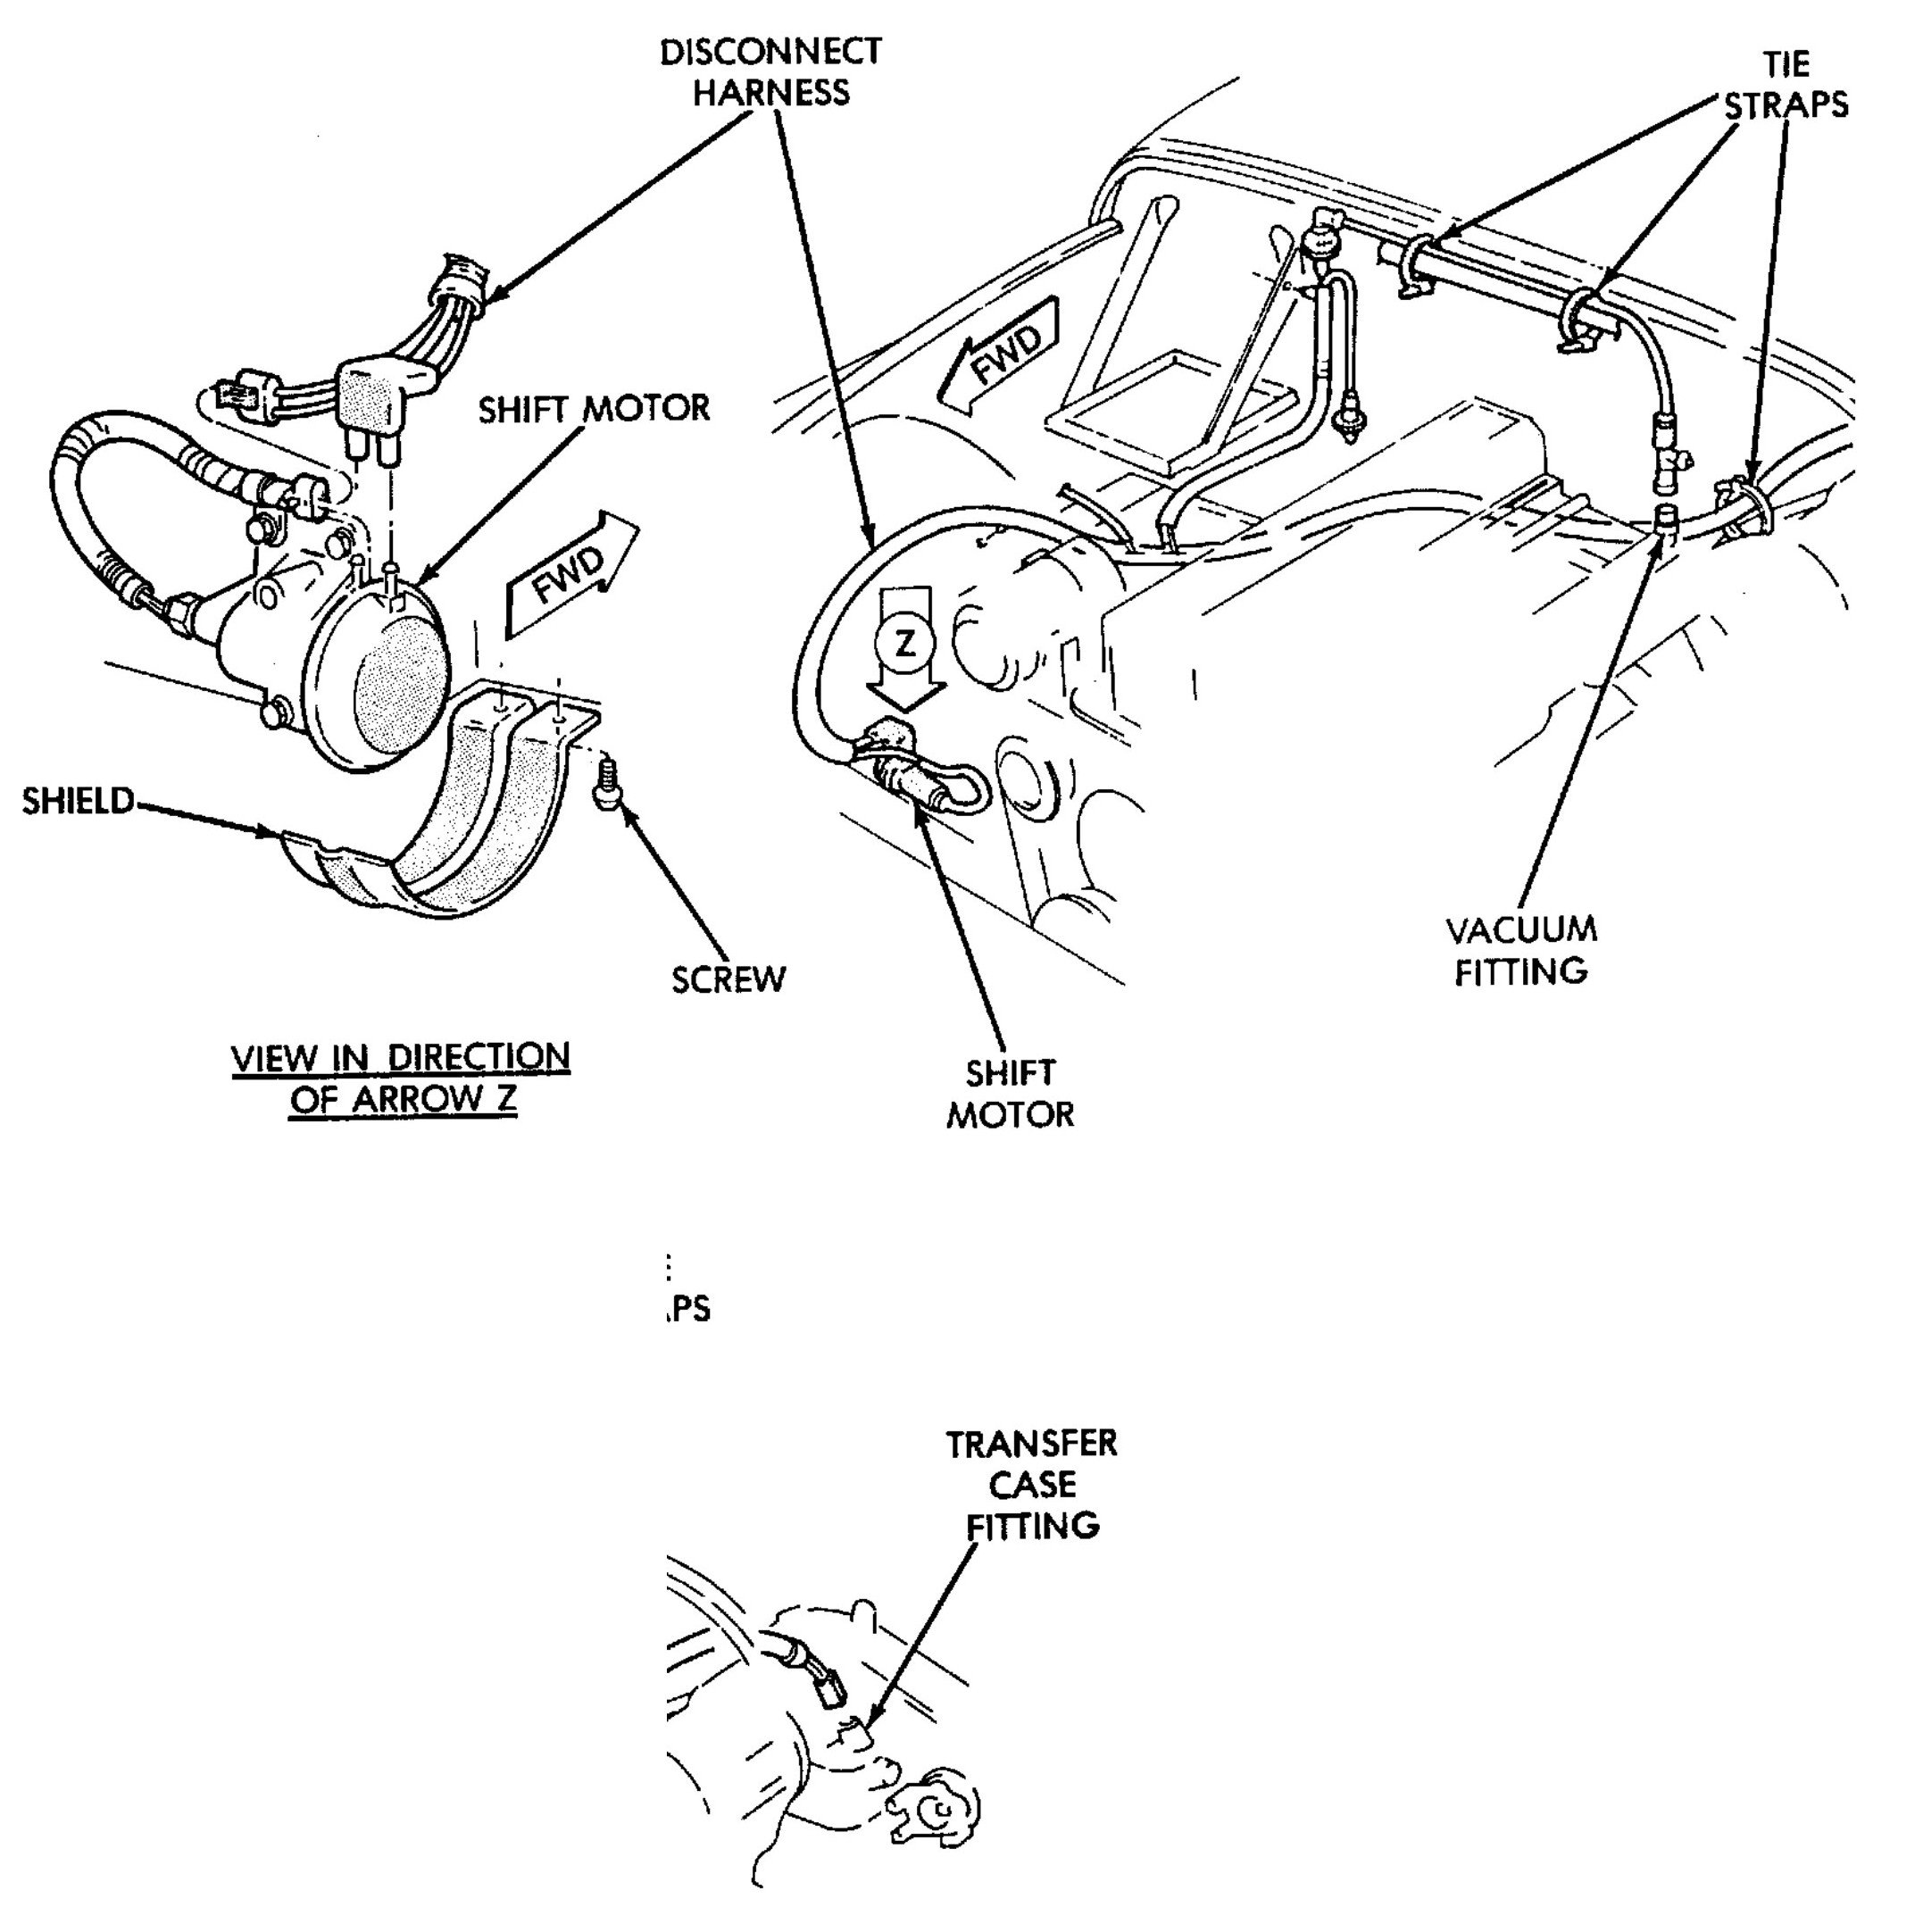 1990 jeep wrangler wiring harness diagram fk 0520  wrangler 1990 jeep wrangler vacuum line diagram from  wrangler 1990 jeep wrangler vacuum line